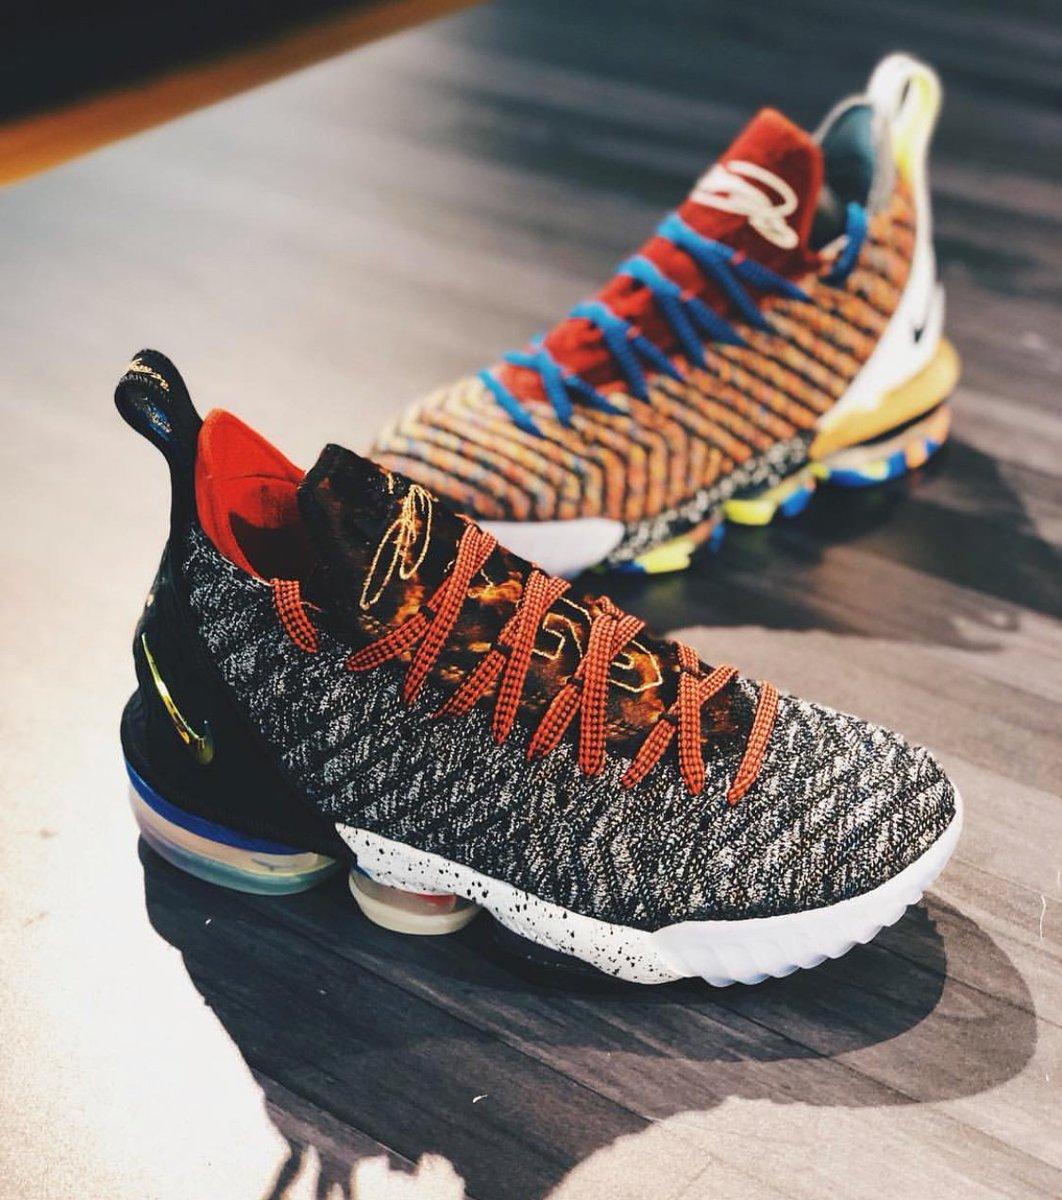 quality design 3d9e0 1cc3e Sneaker Shouts™ on Twitter: